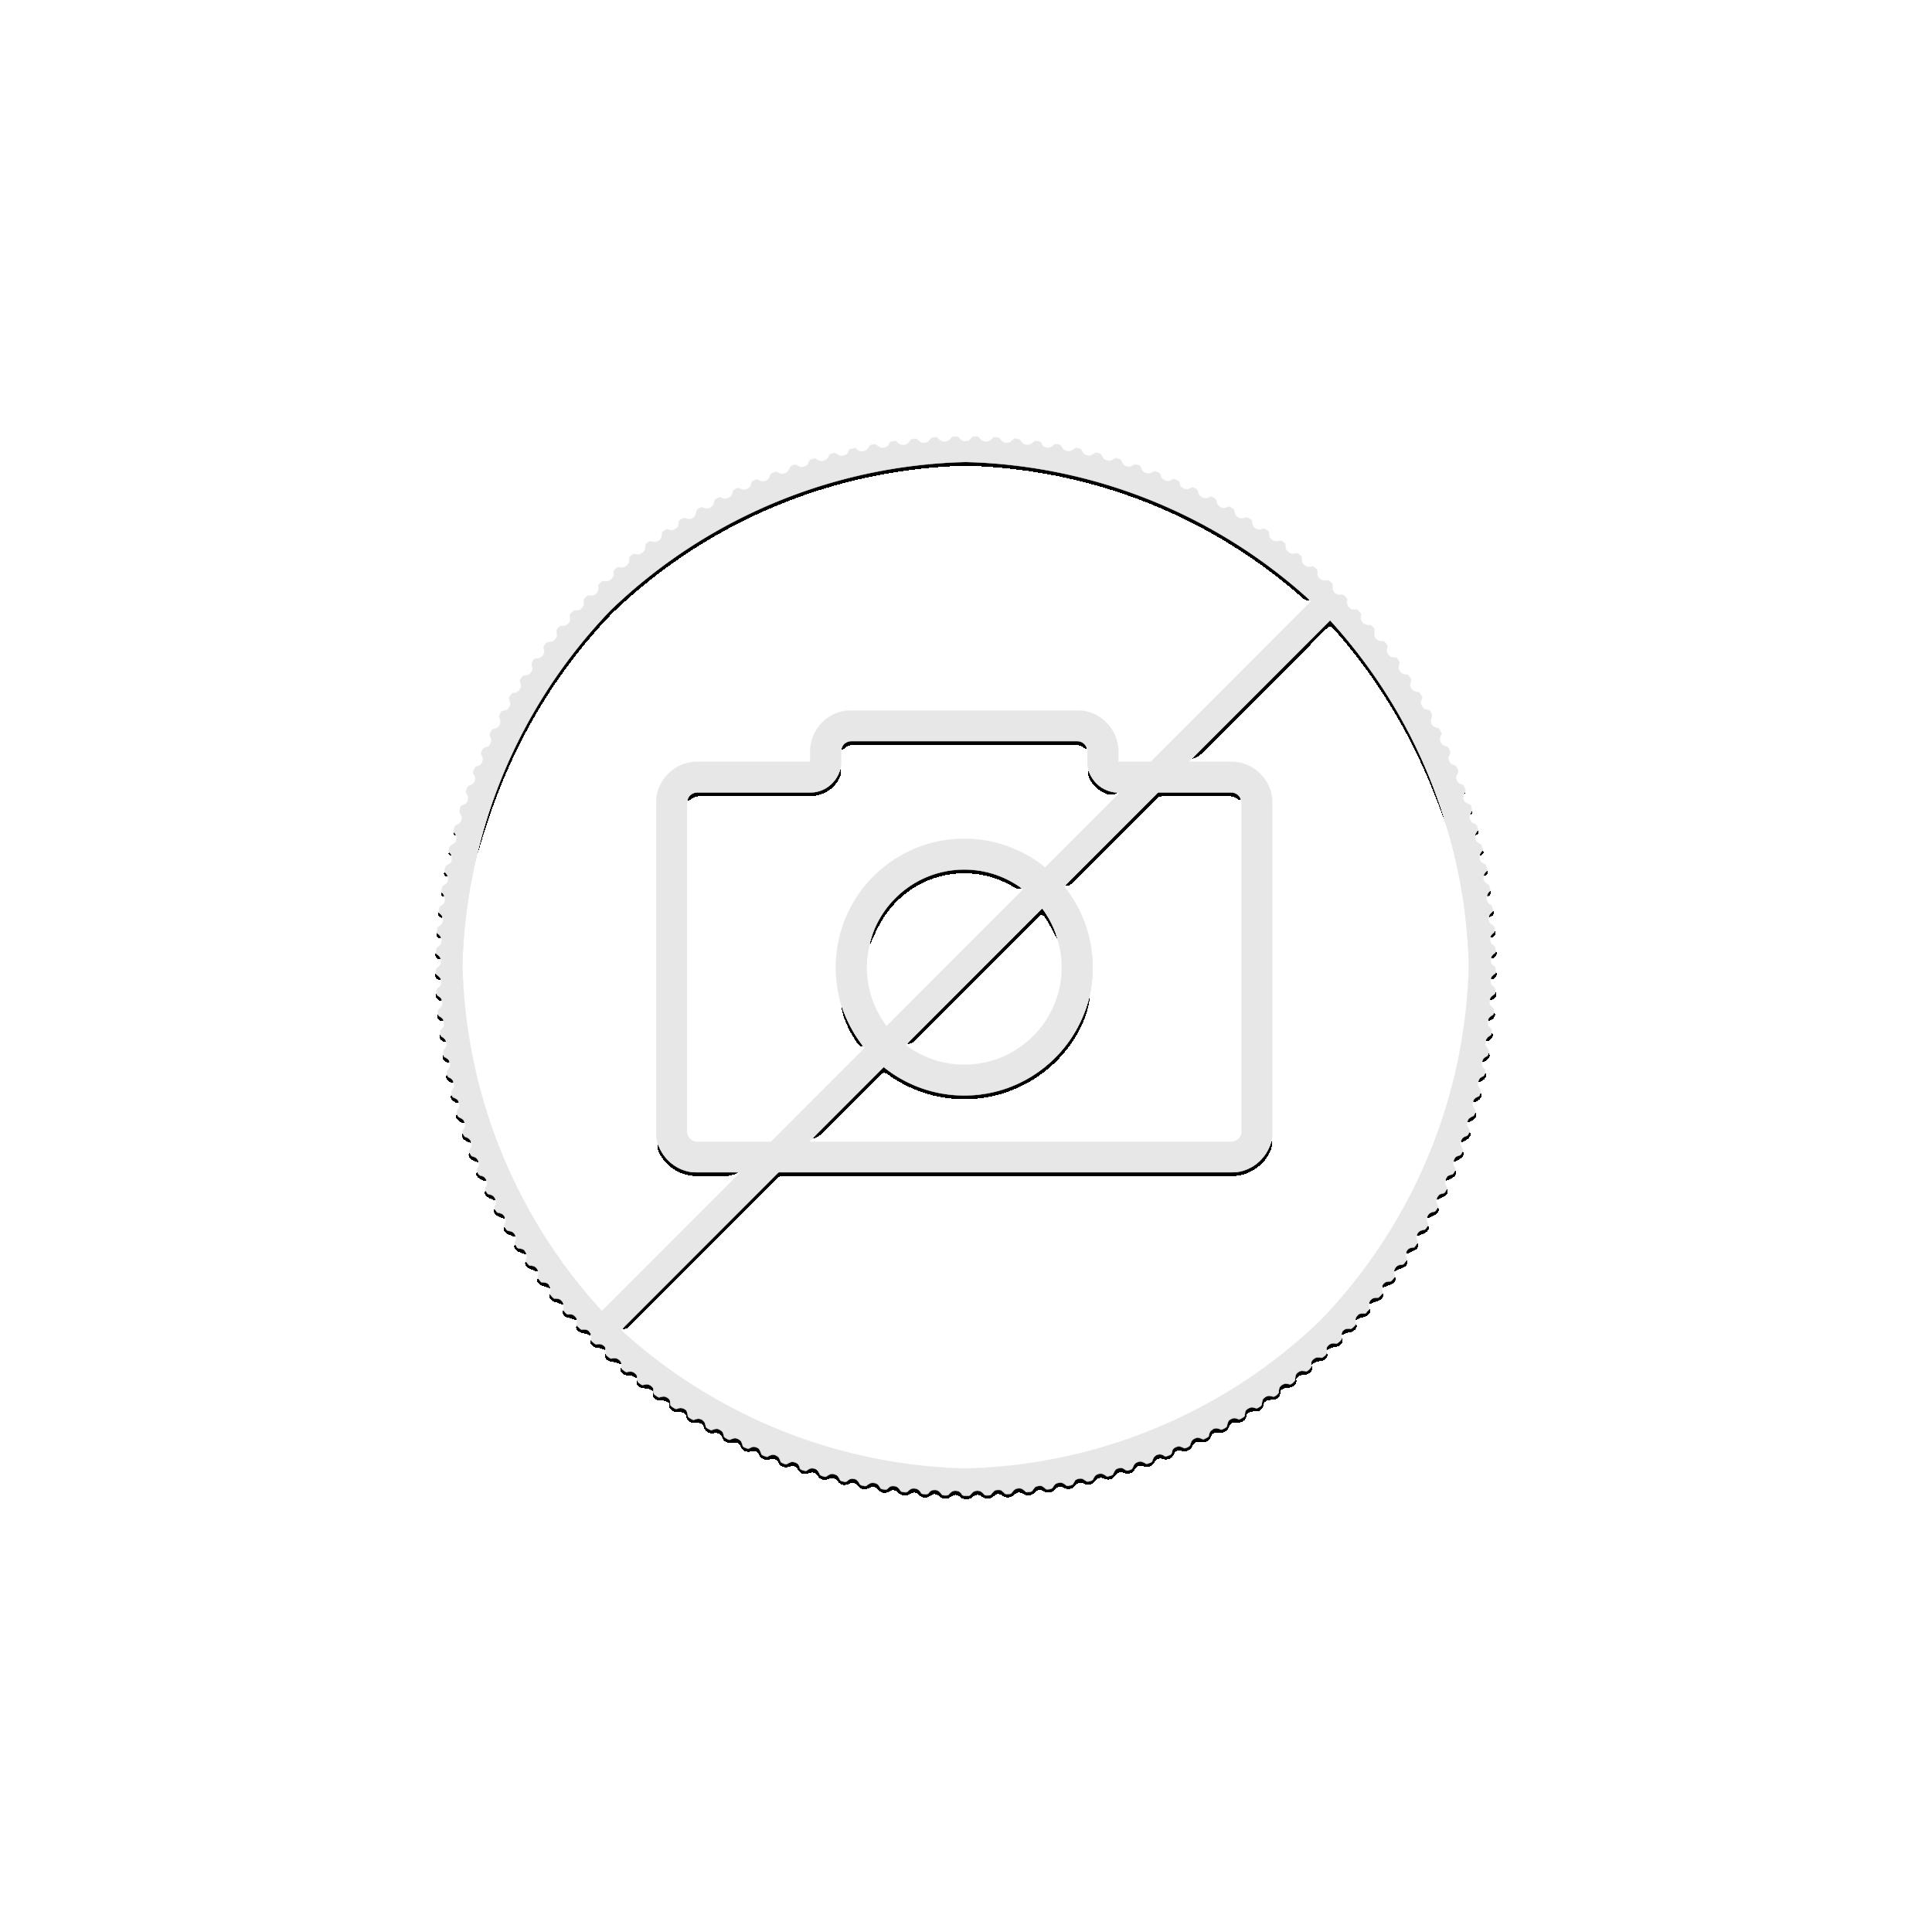 2 troy ounce zilveren munt masker 2021